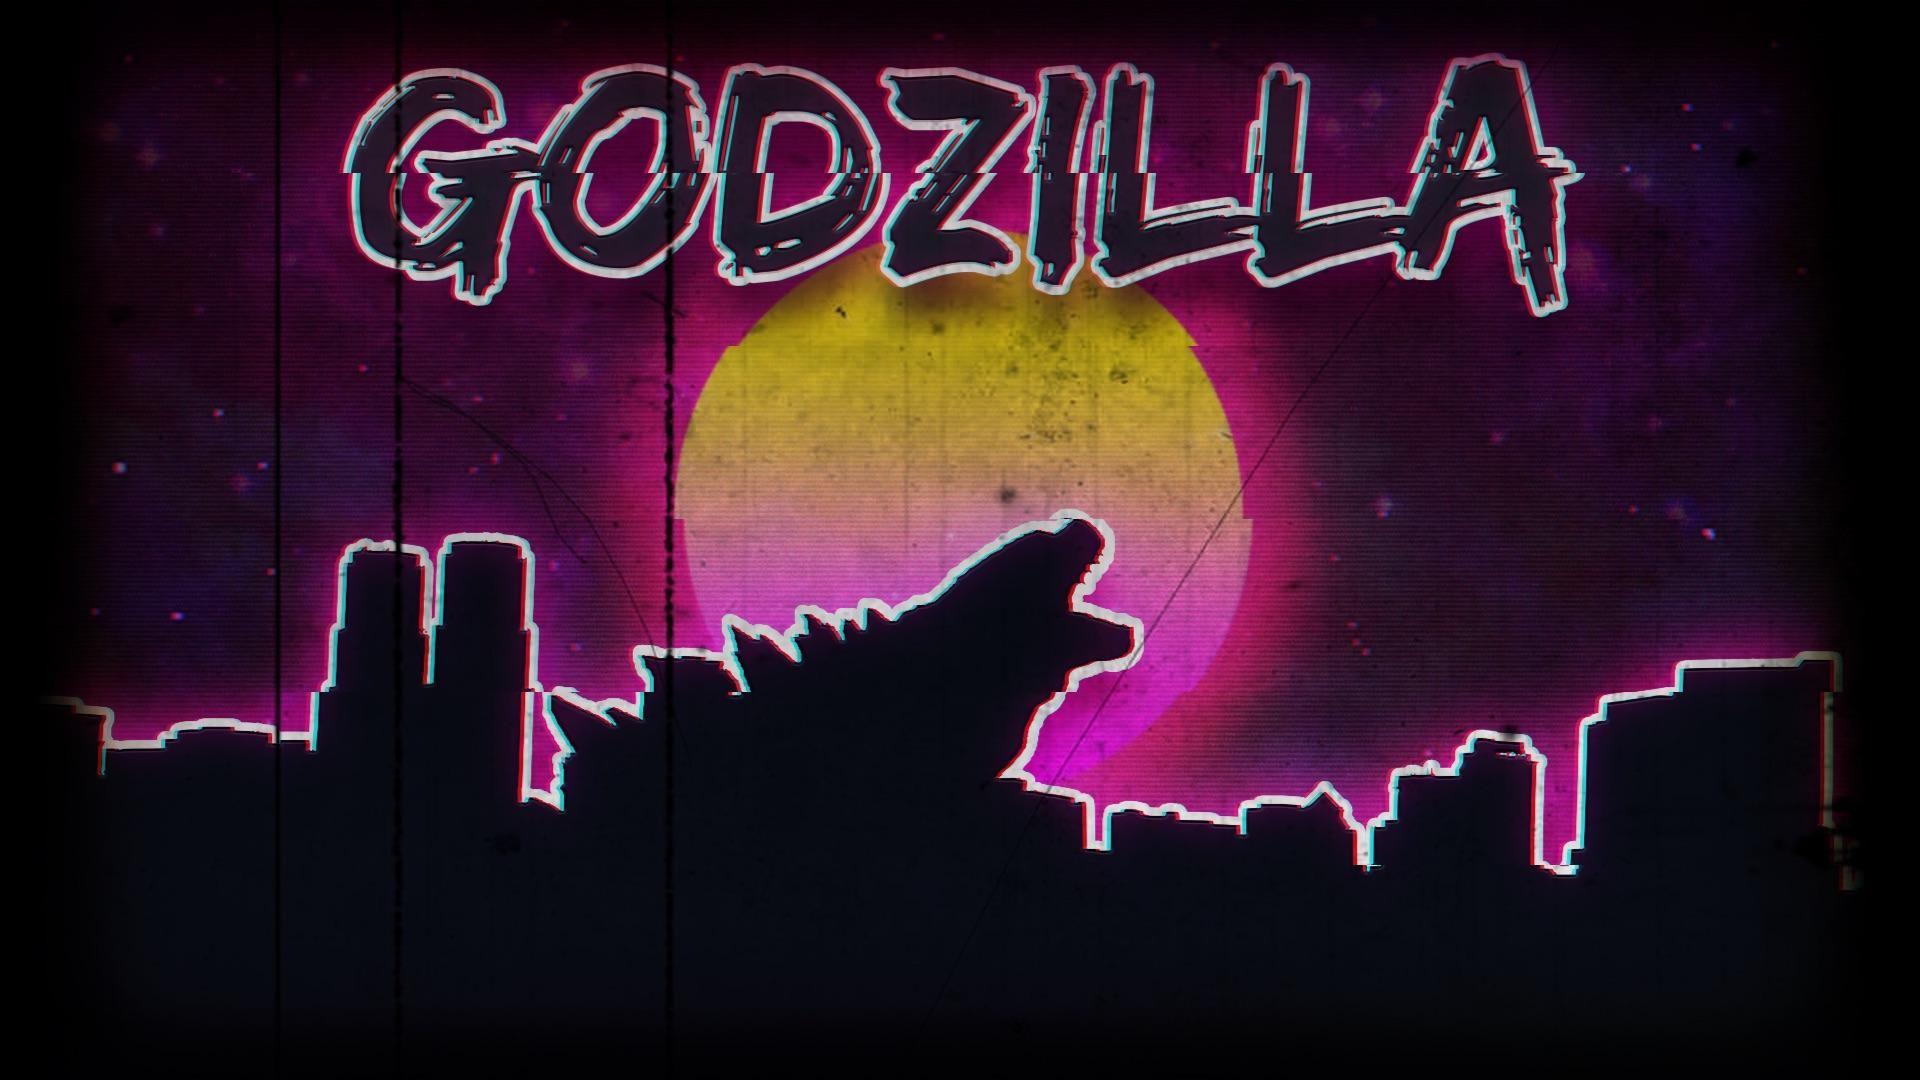 16 Luxury Pubg Wallpaper Iphone 6: A Retro 80s Style Godzilla Wallpaper I Threw Together In